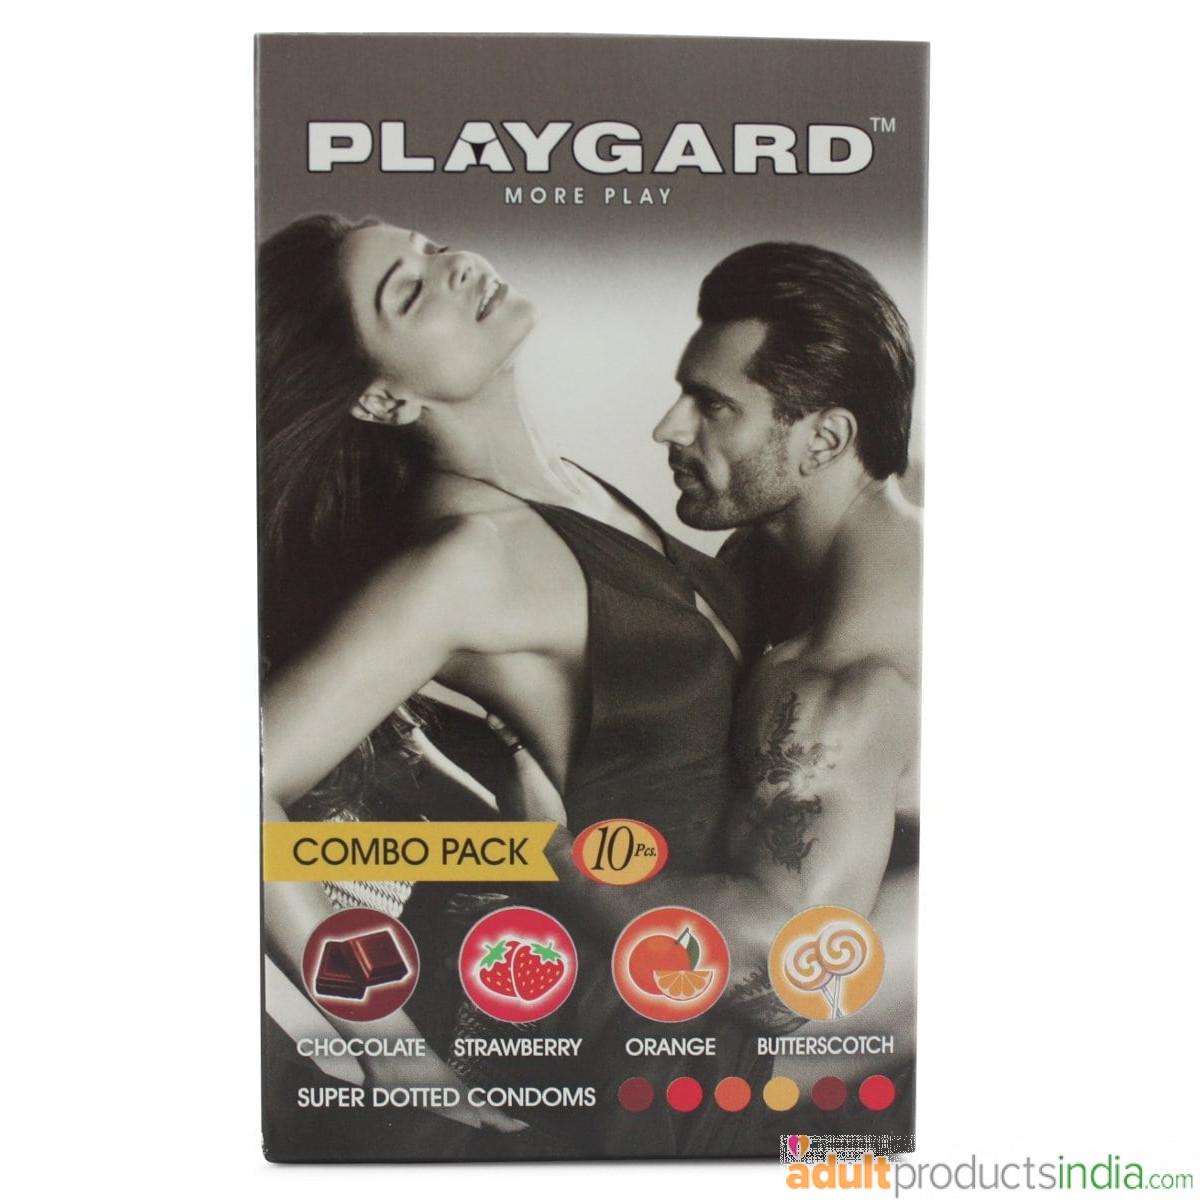 Playgard Mixed 10 pack